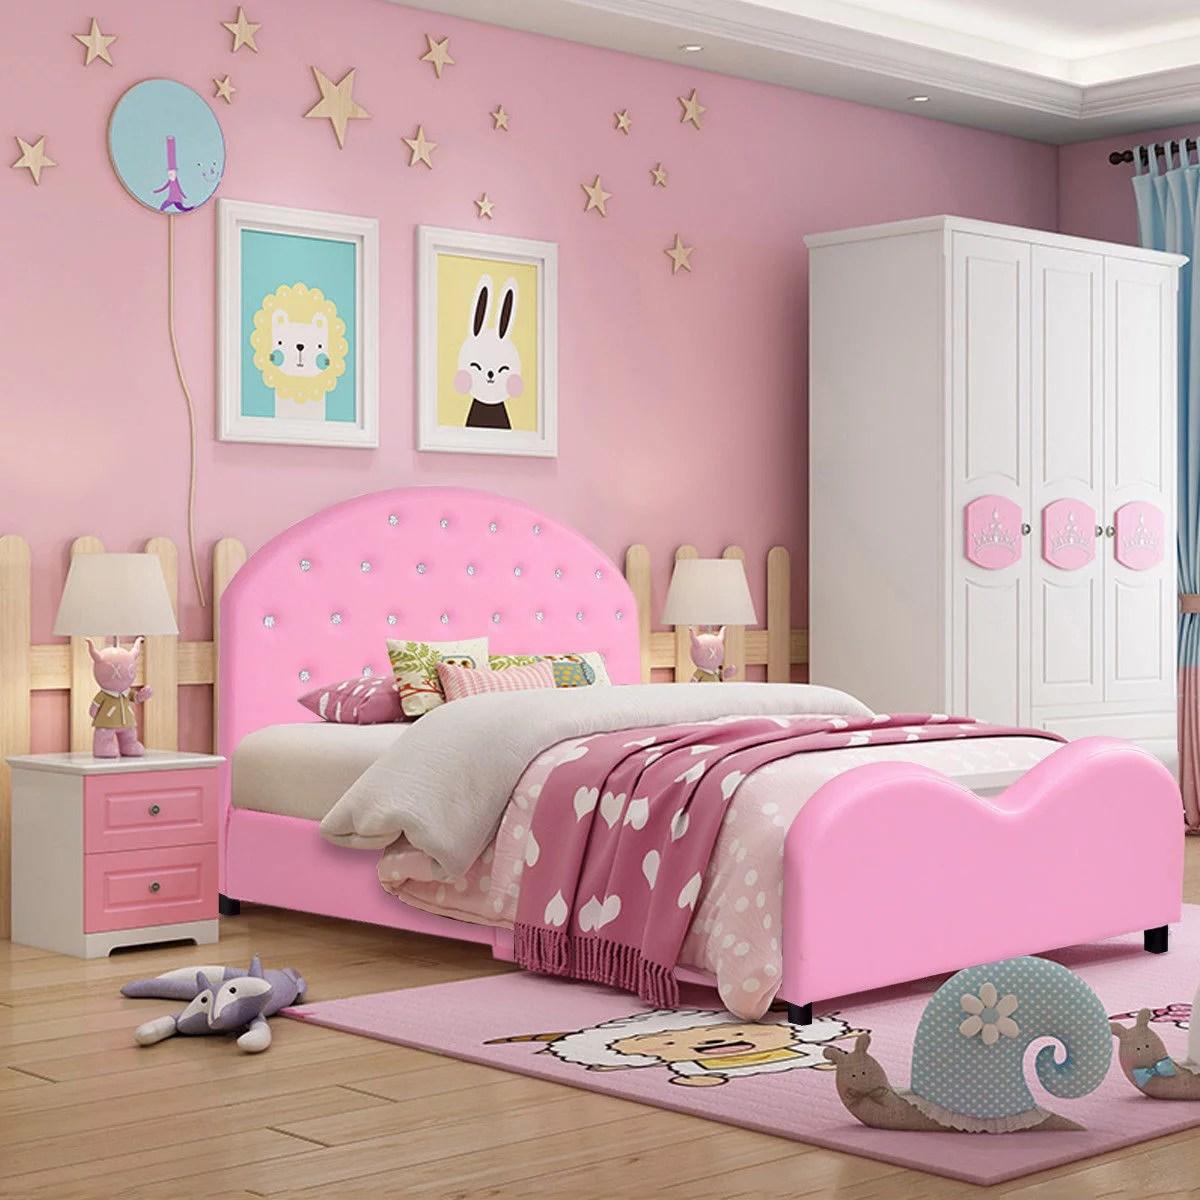 Costway Kids Children Pu Upholstered Platform Wooden Princess Bed Bedroom Furniture Pink Walmart Canada